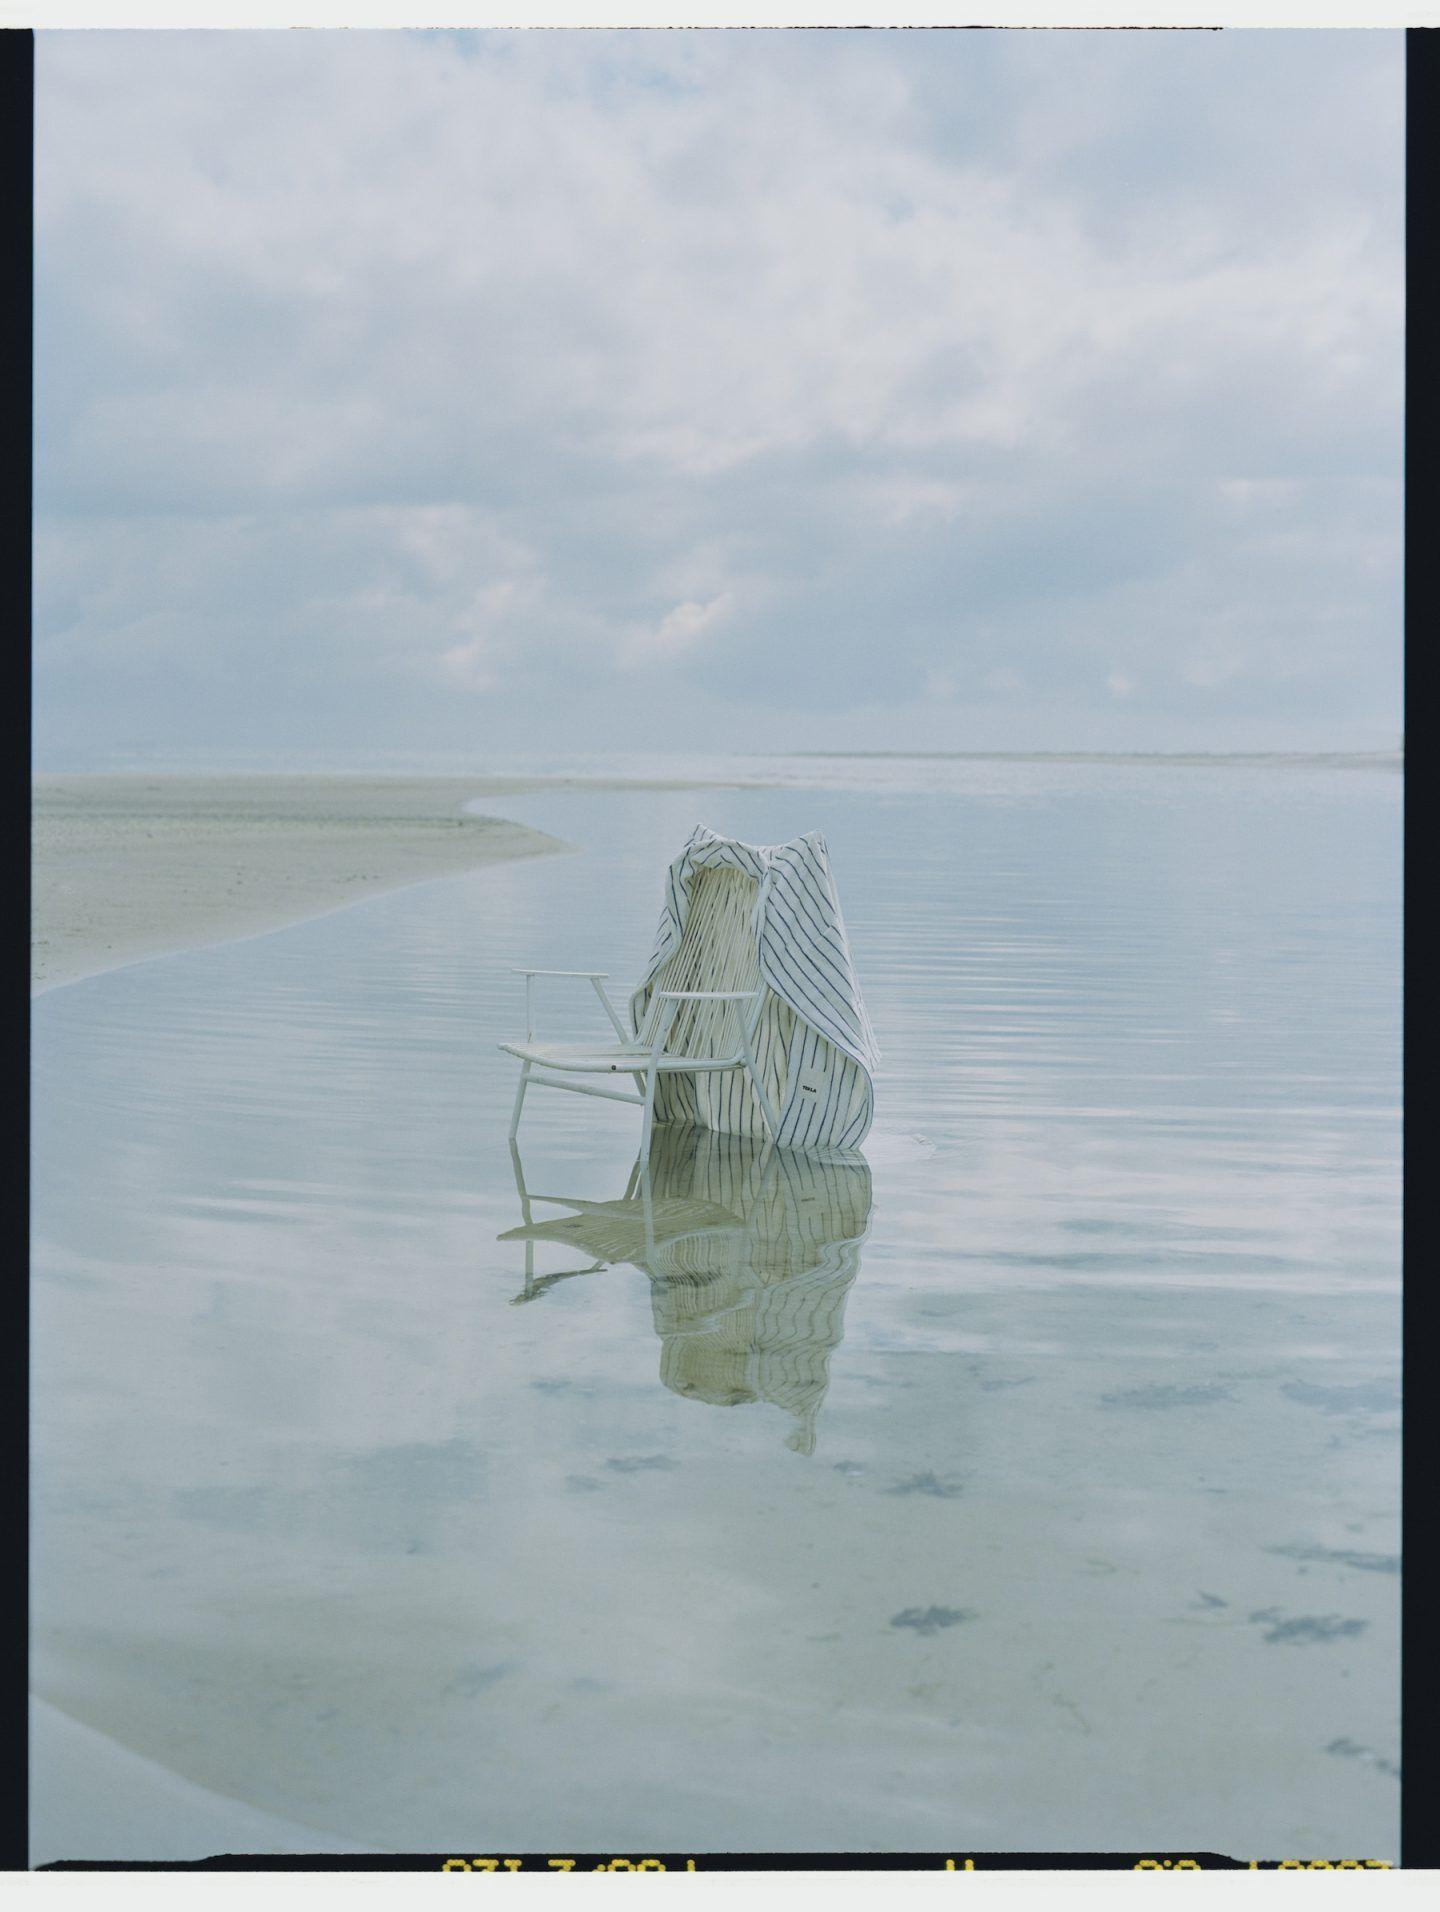 IGNANT-Photography-Tekla-Philip-Messmann-04